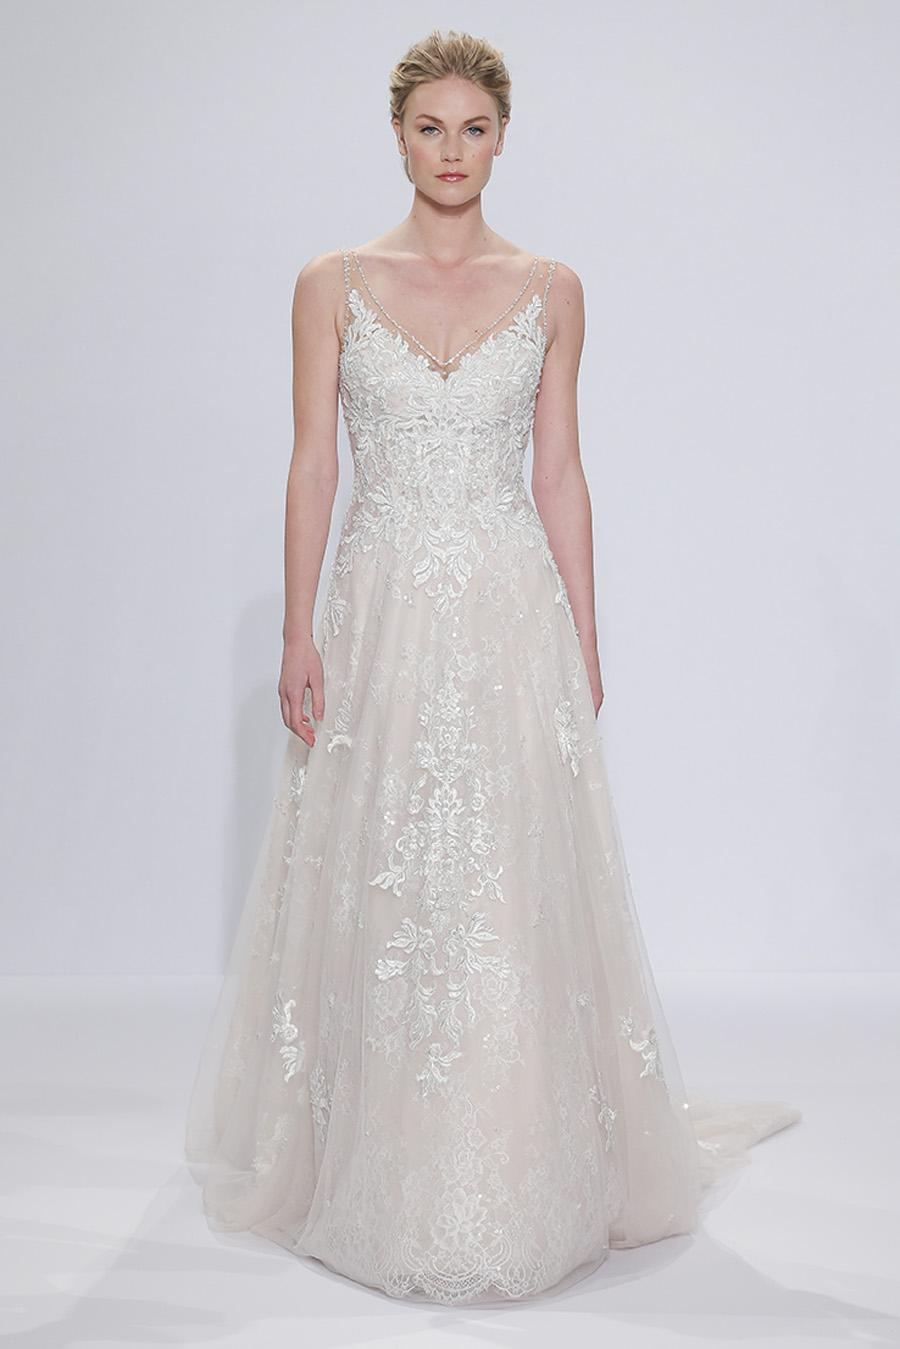 Randy Fenoli Bridal Collection gown 8